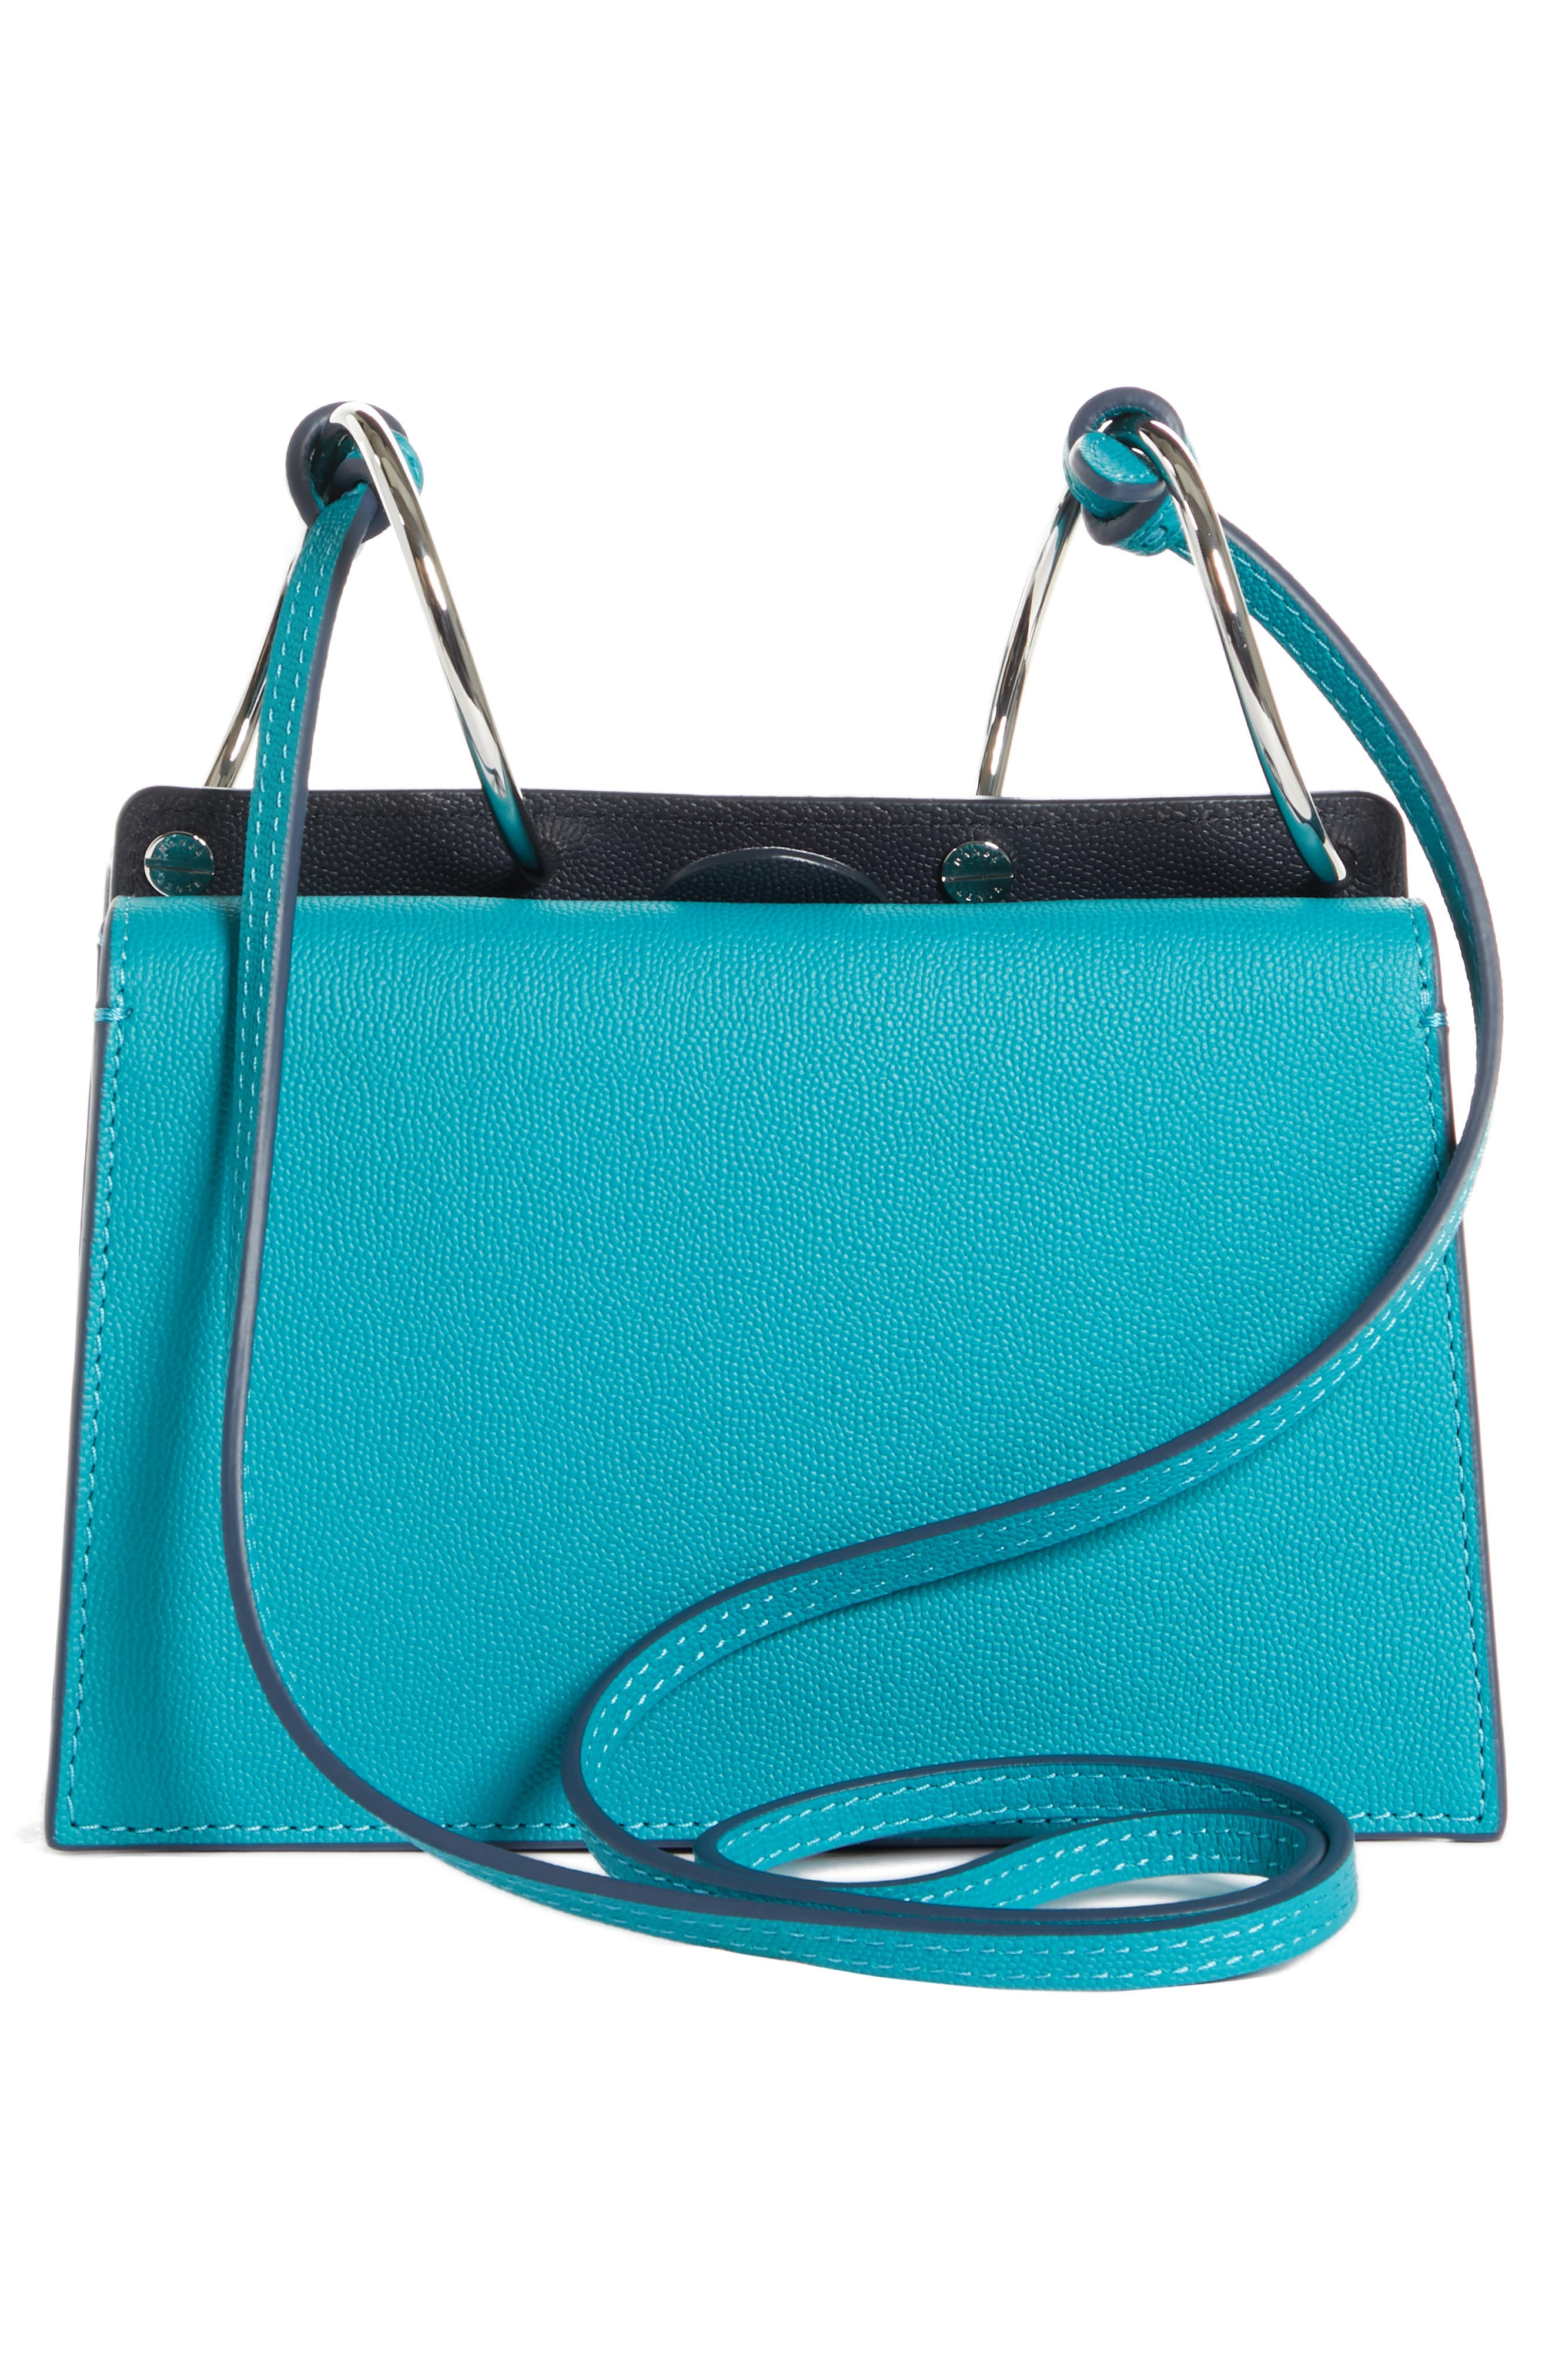 Mini Phoebe Leather Bag,                             Alternate thumbnail 3, color,                             TURQUOISE